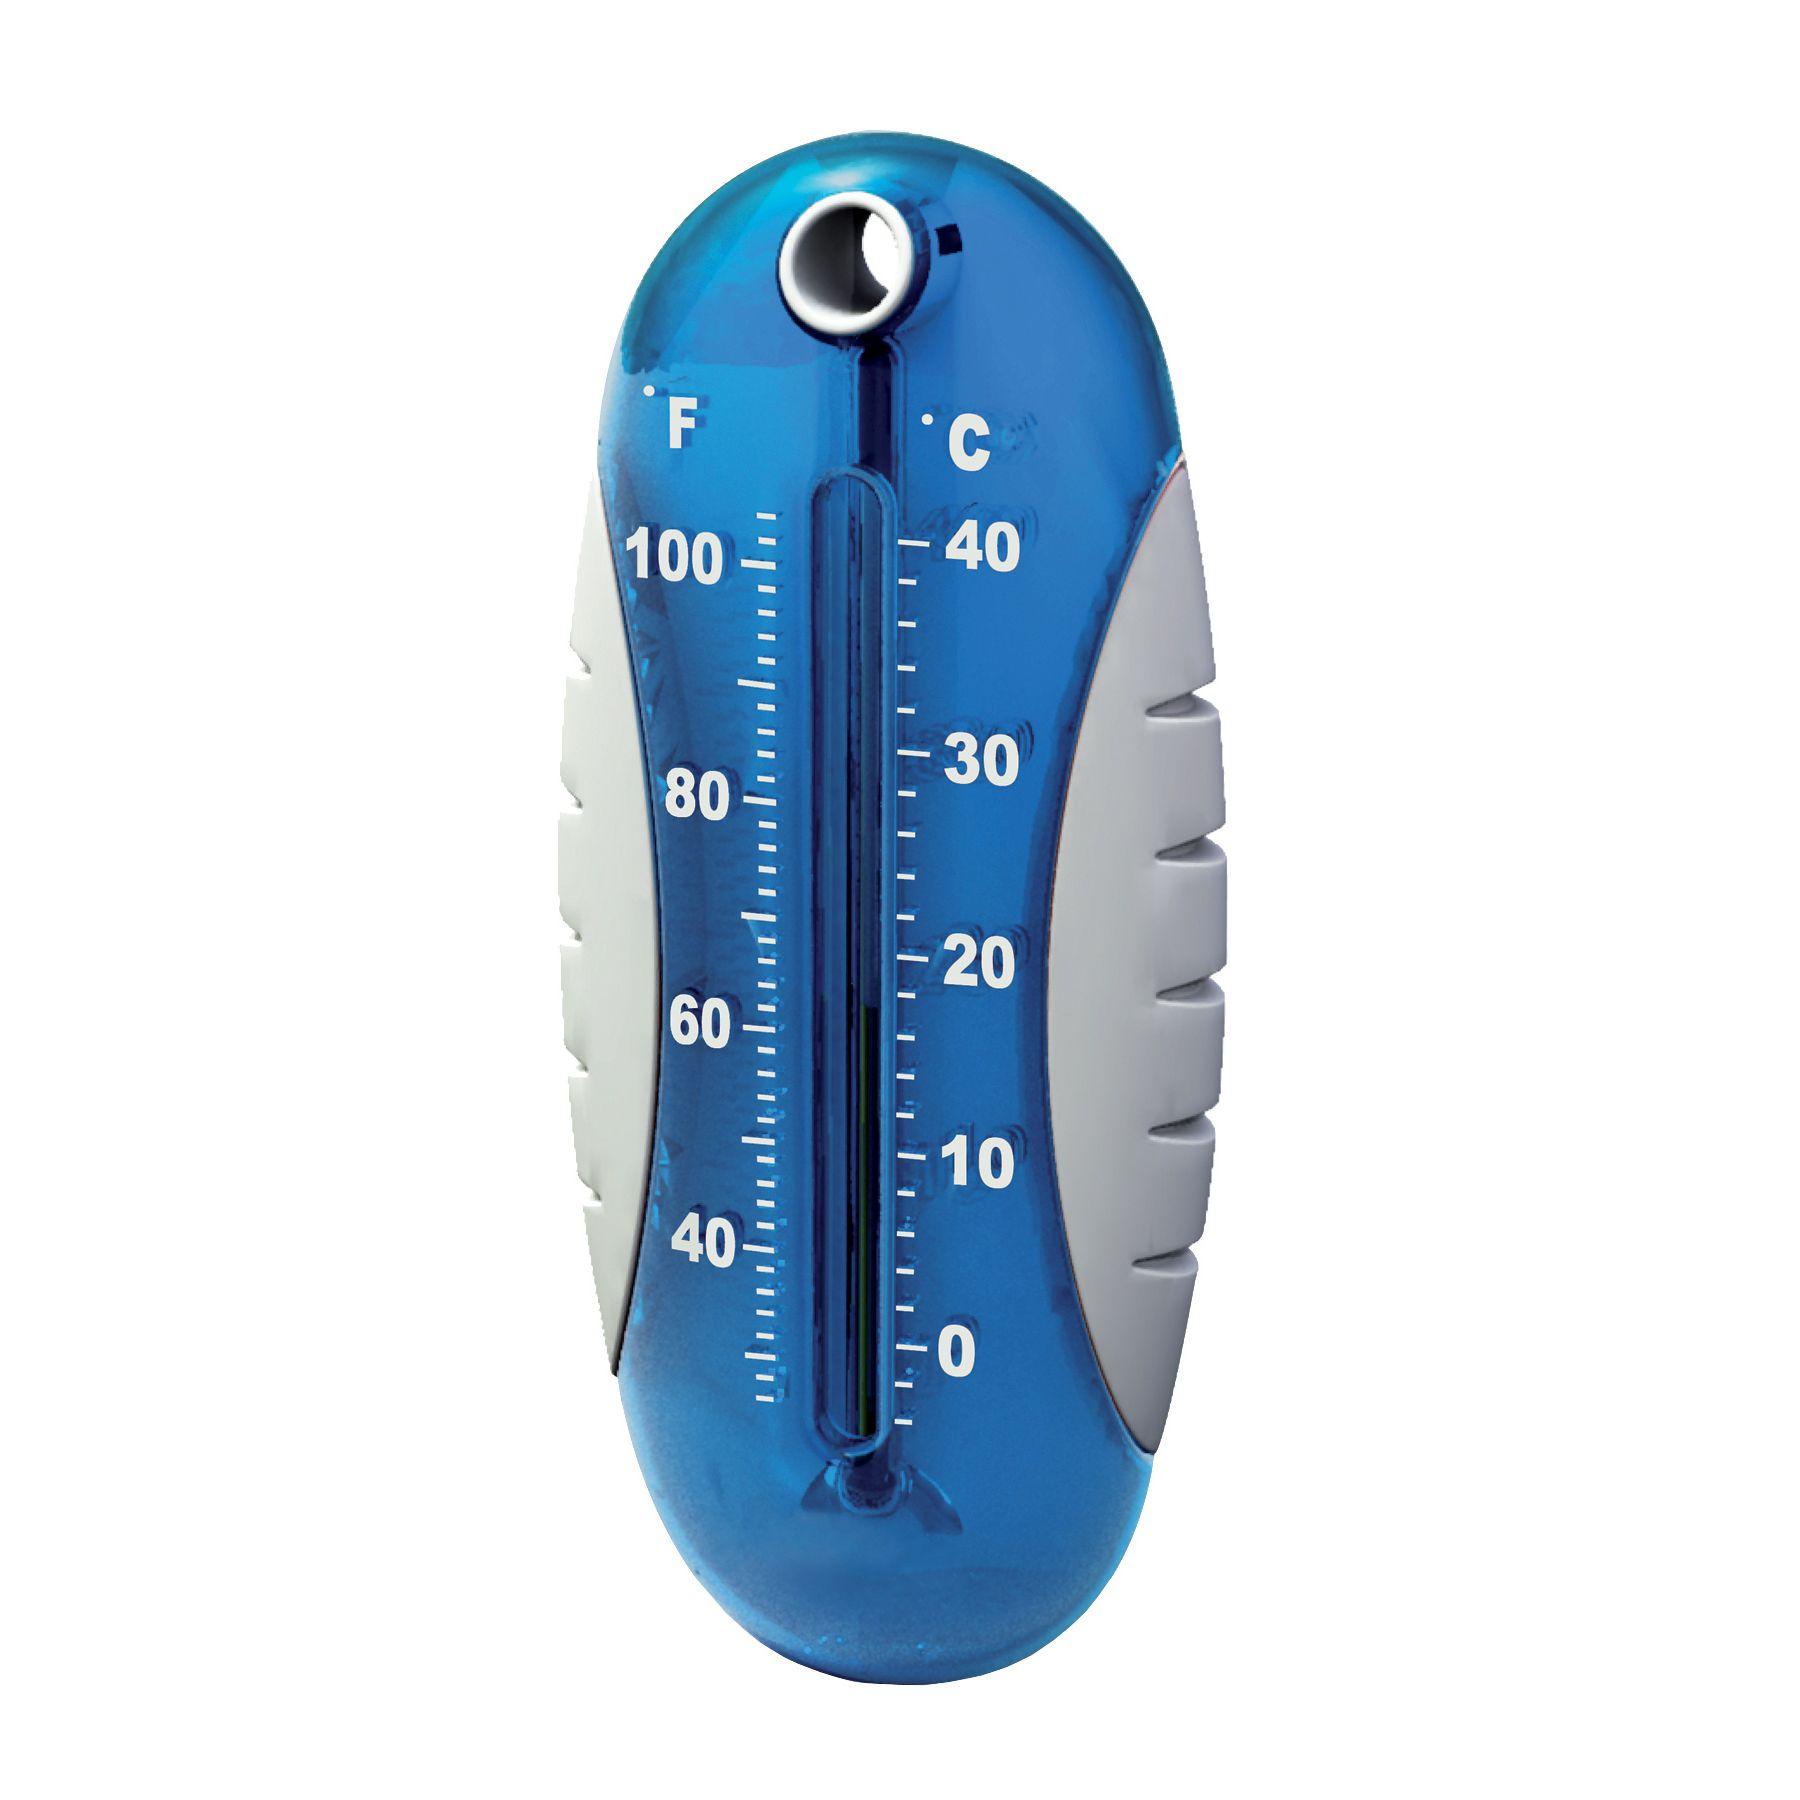 Thermomètre De Piscine à Thermometre De Piscine